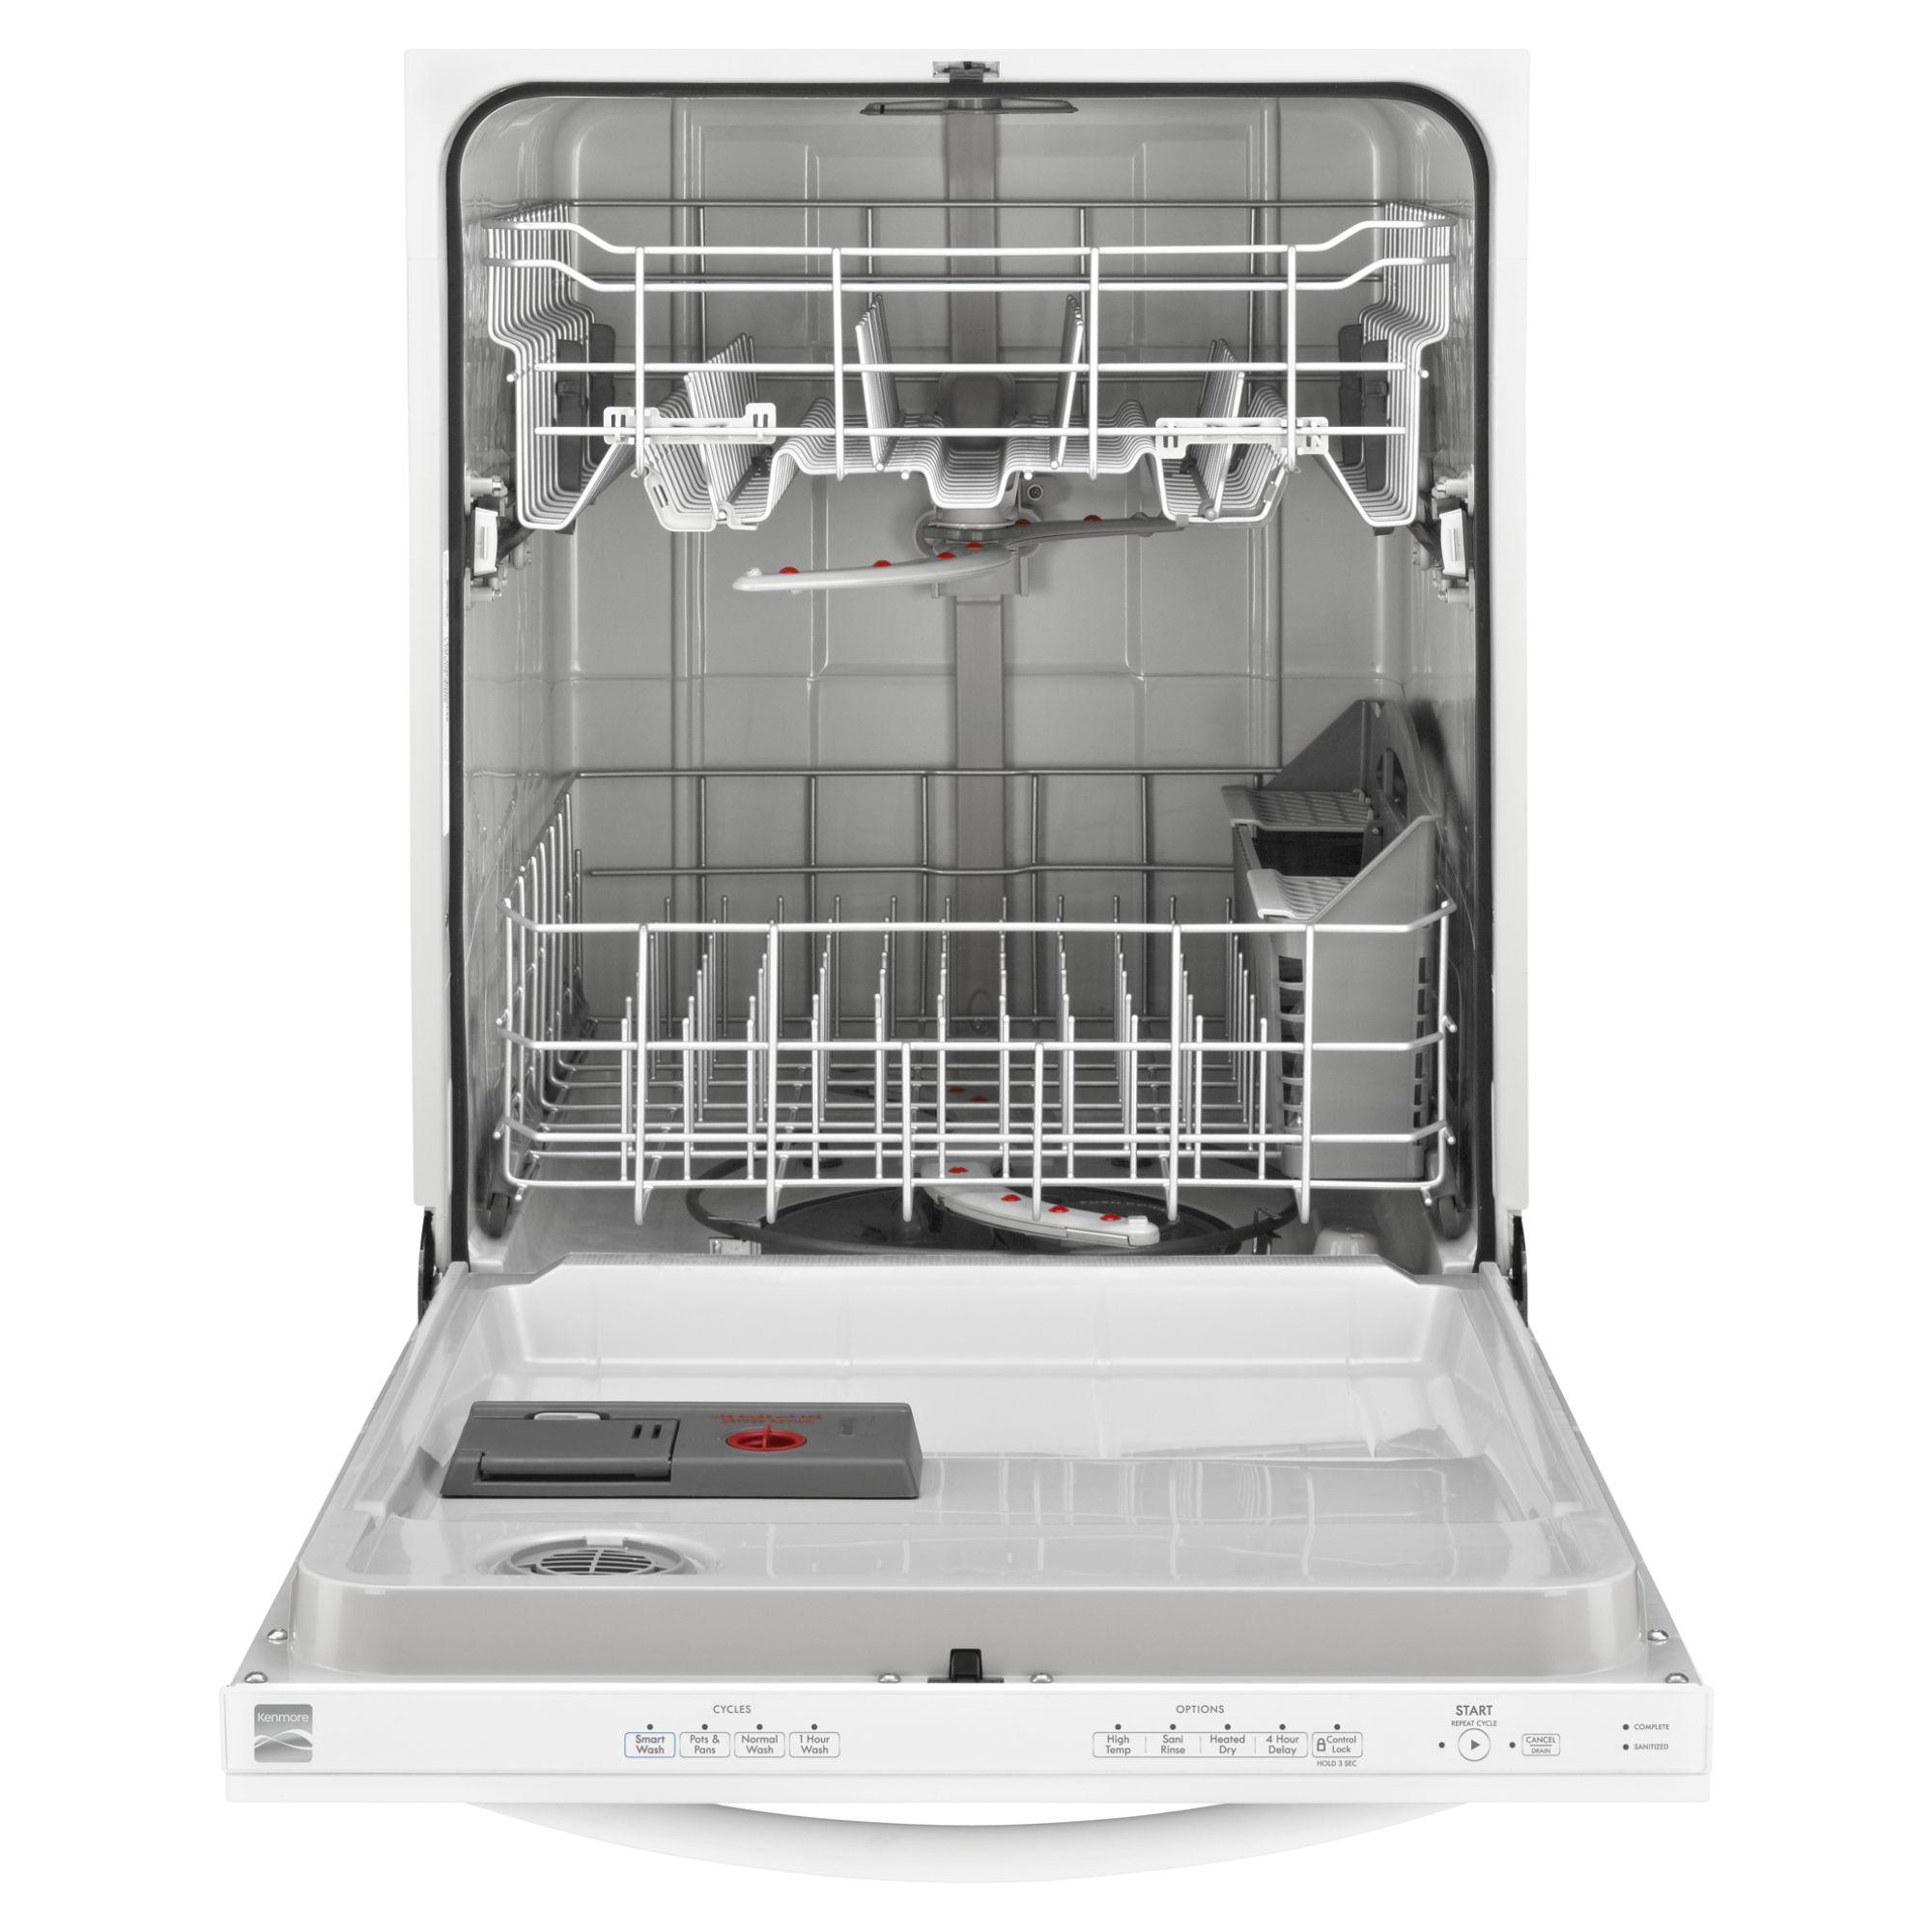 "Kenmore 24"" Built-In Dishwasher - White"